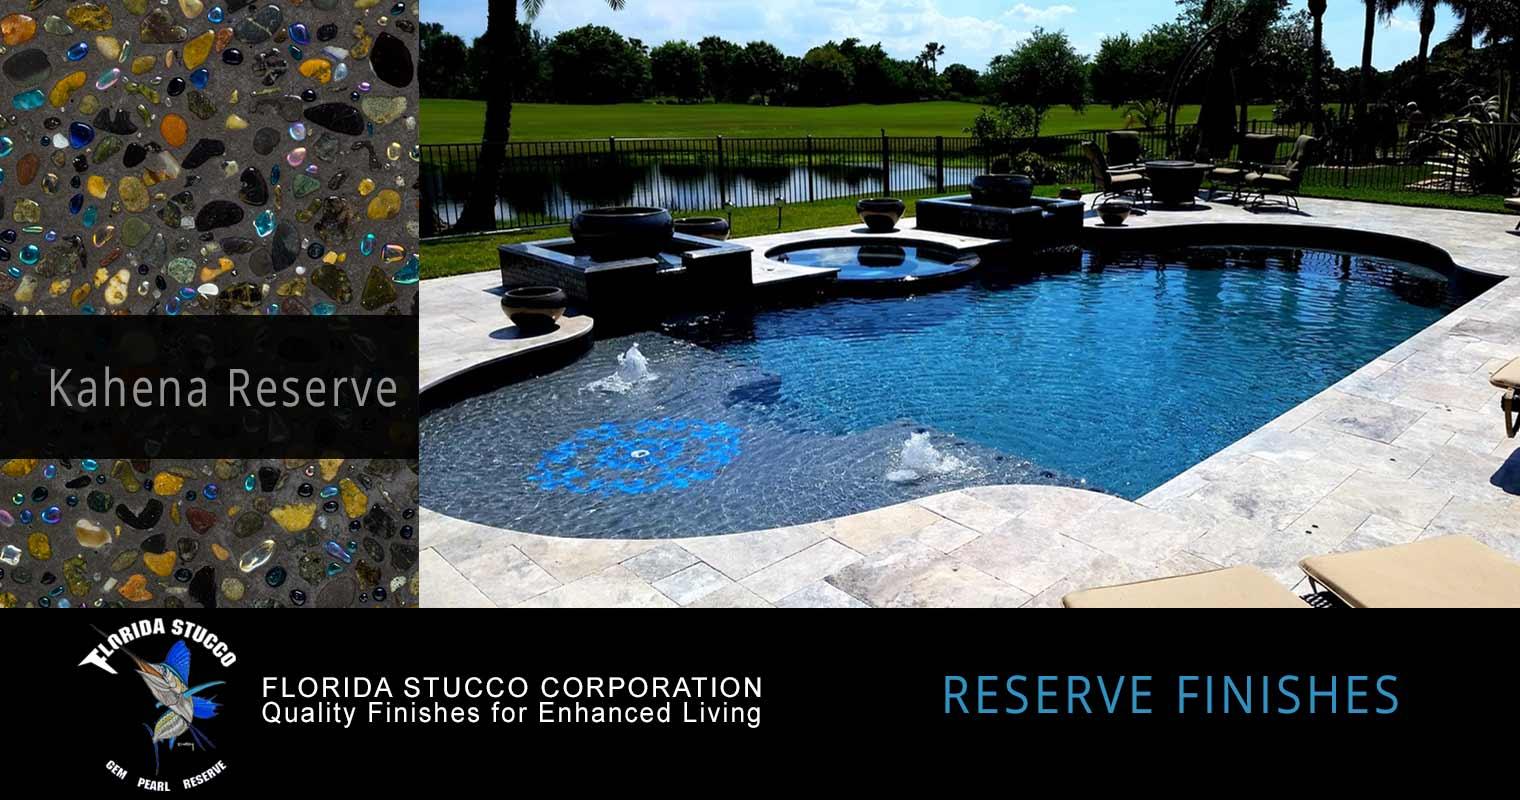 Florida Stucco - Kahena Reserve Gem and Glass Plastering Finish Pool Sample 2